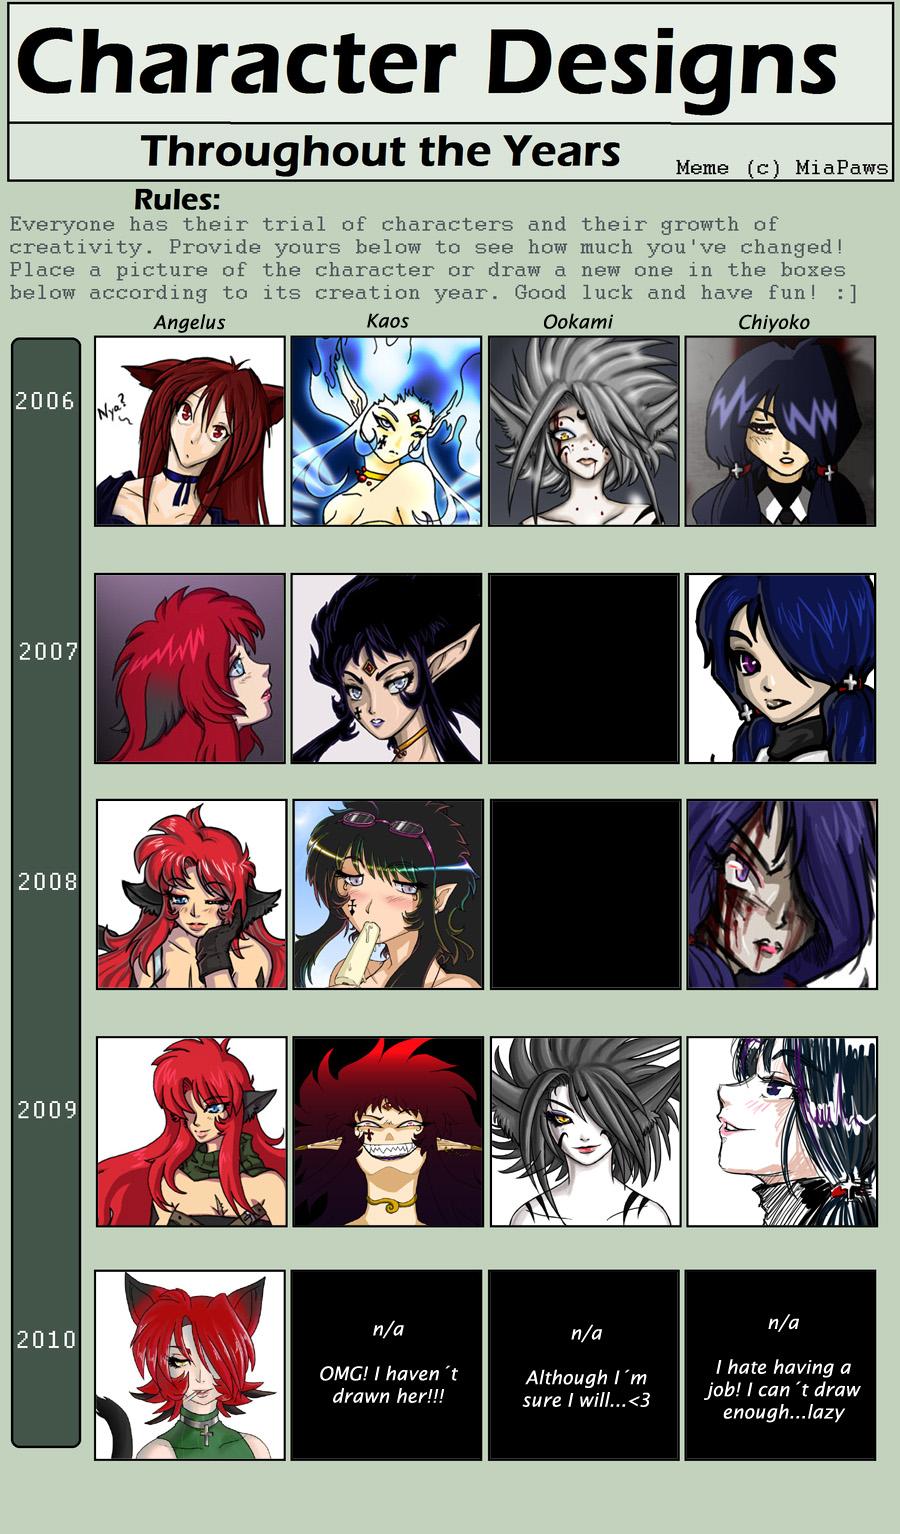 Character Design Meme : Character design meme by crimsonravendesign on deviantart